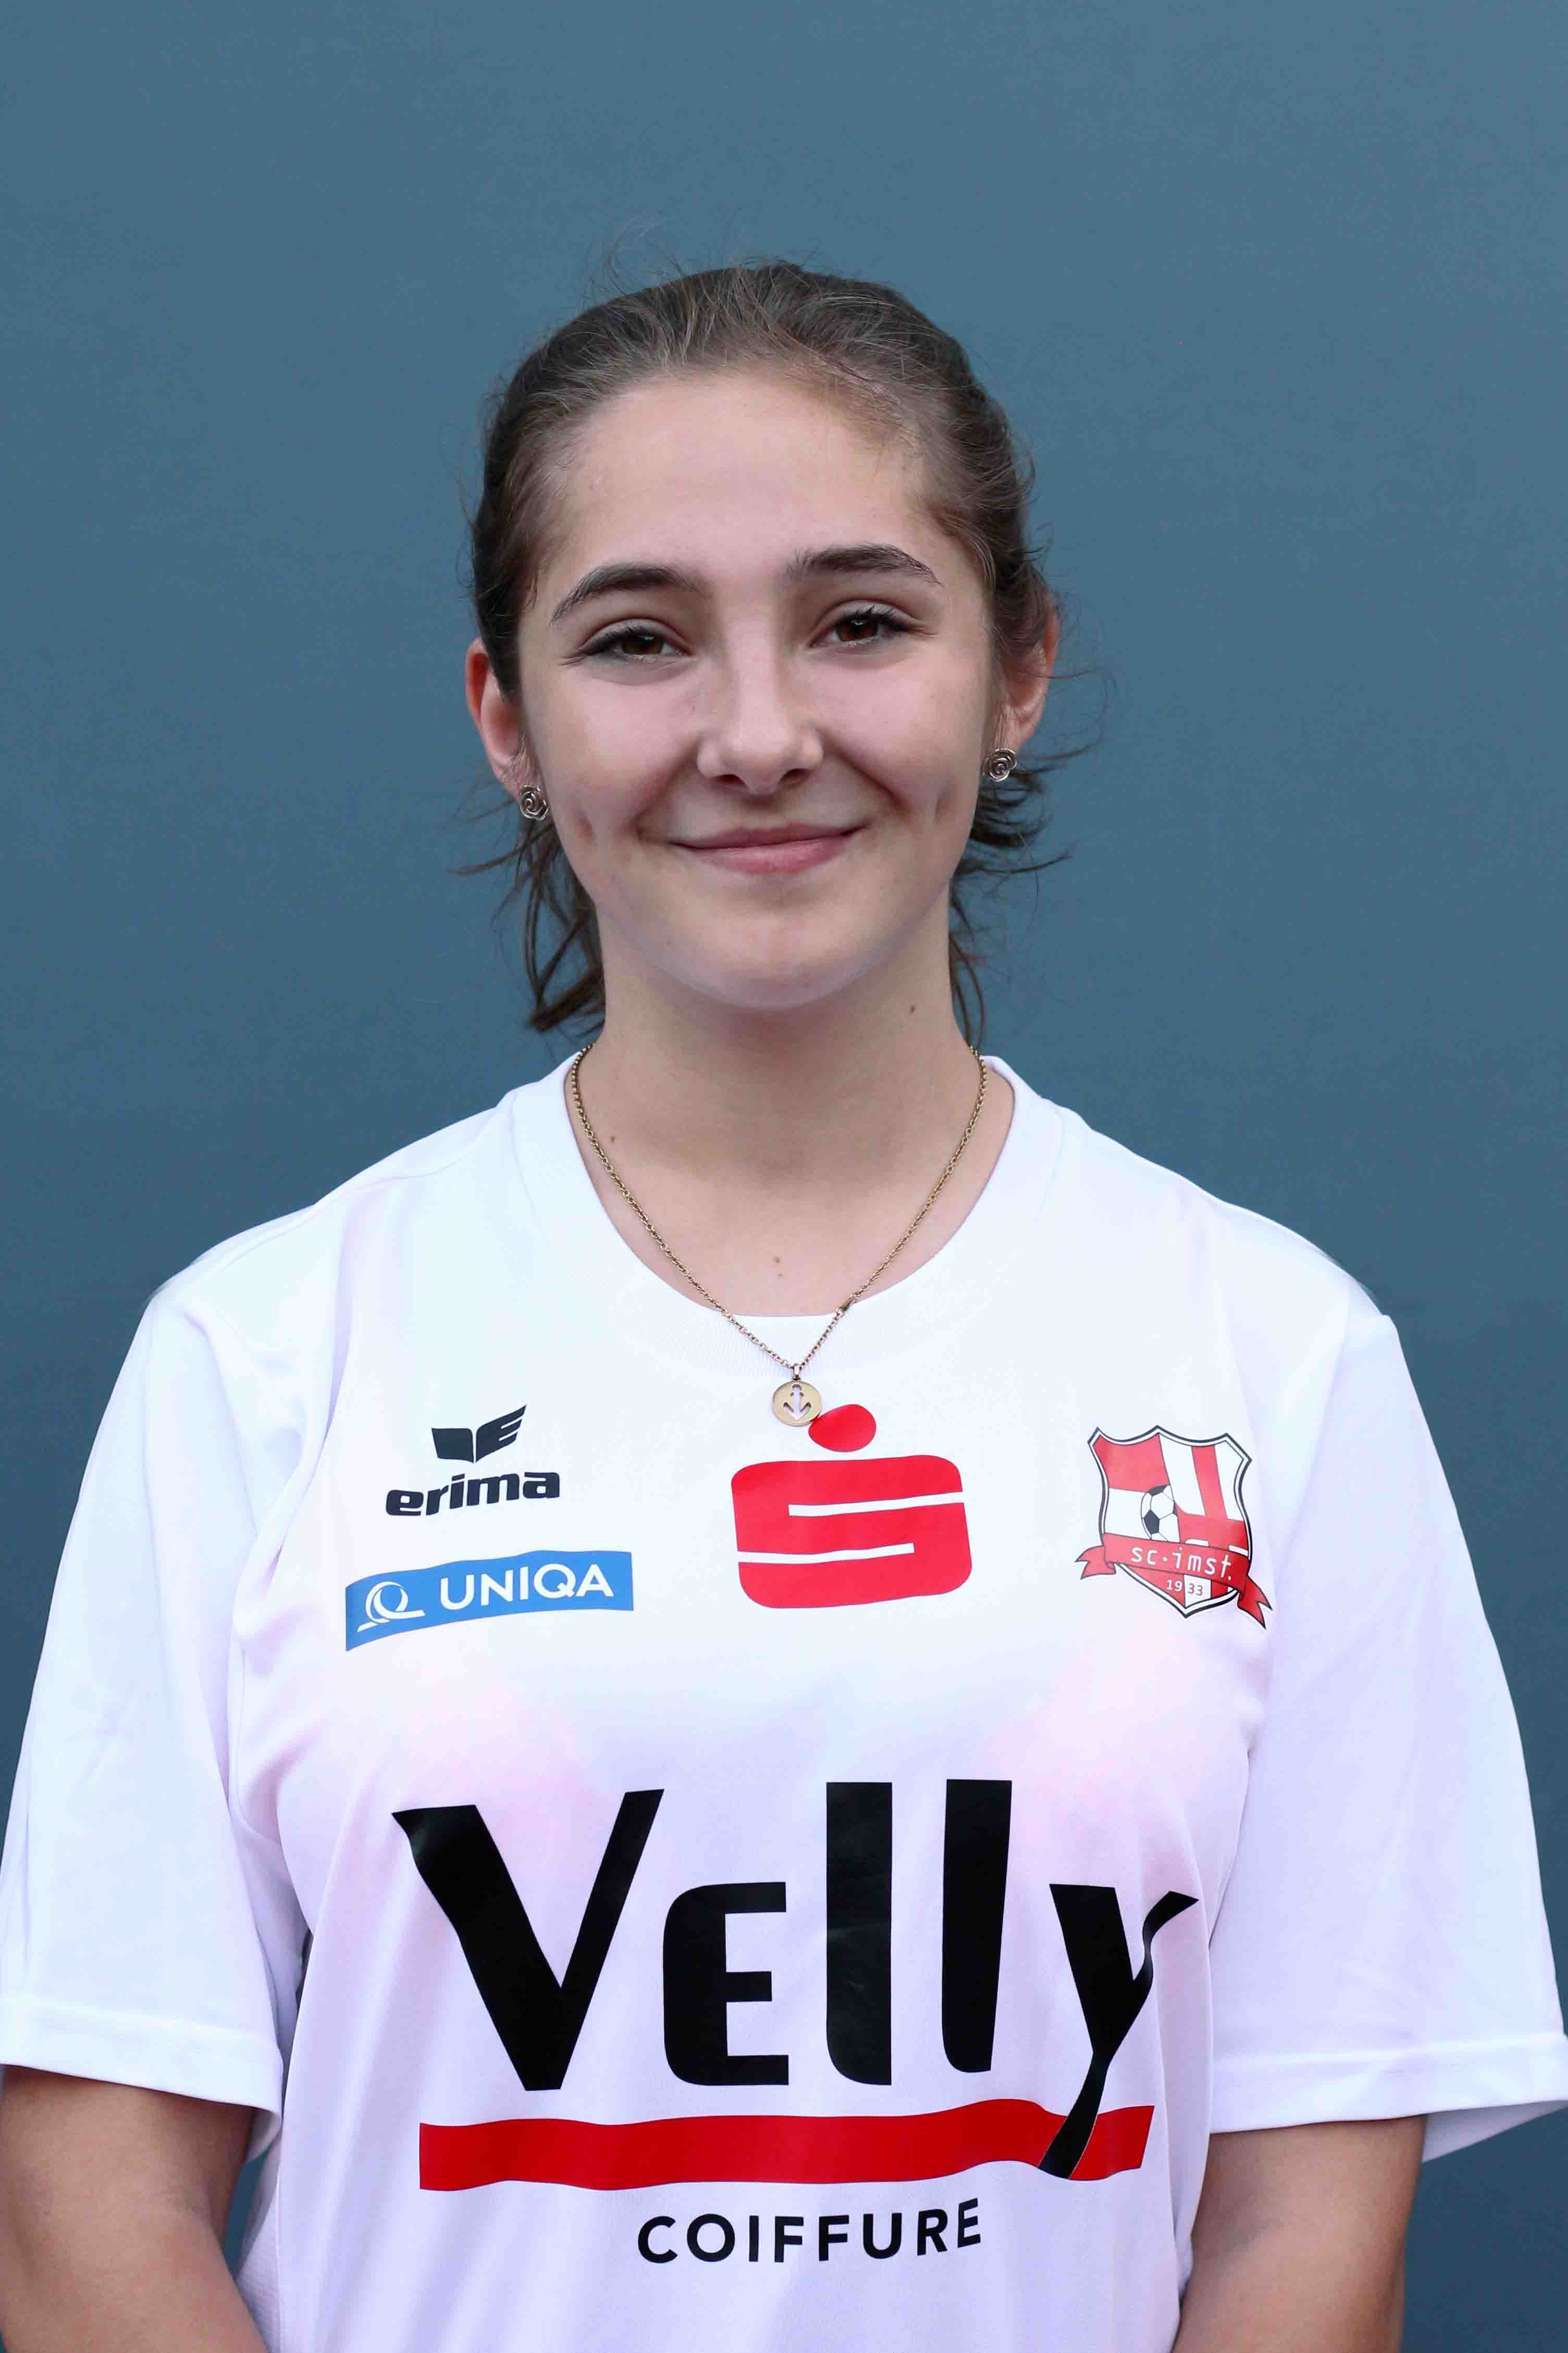 Laura Vonstadl